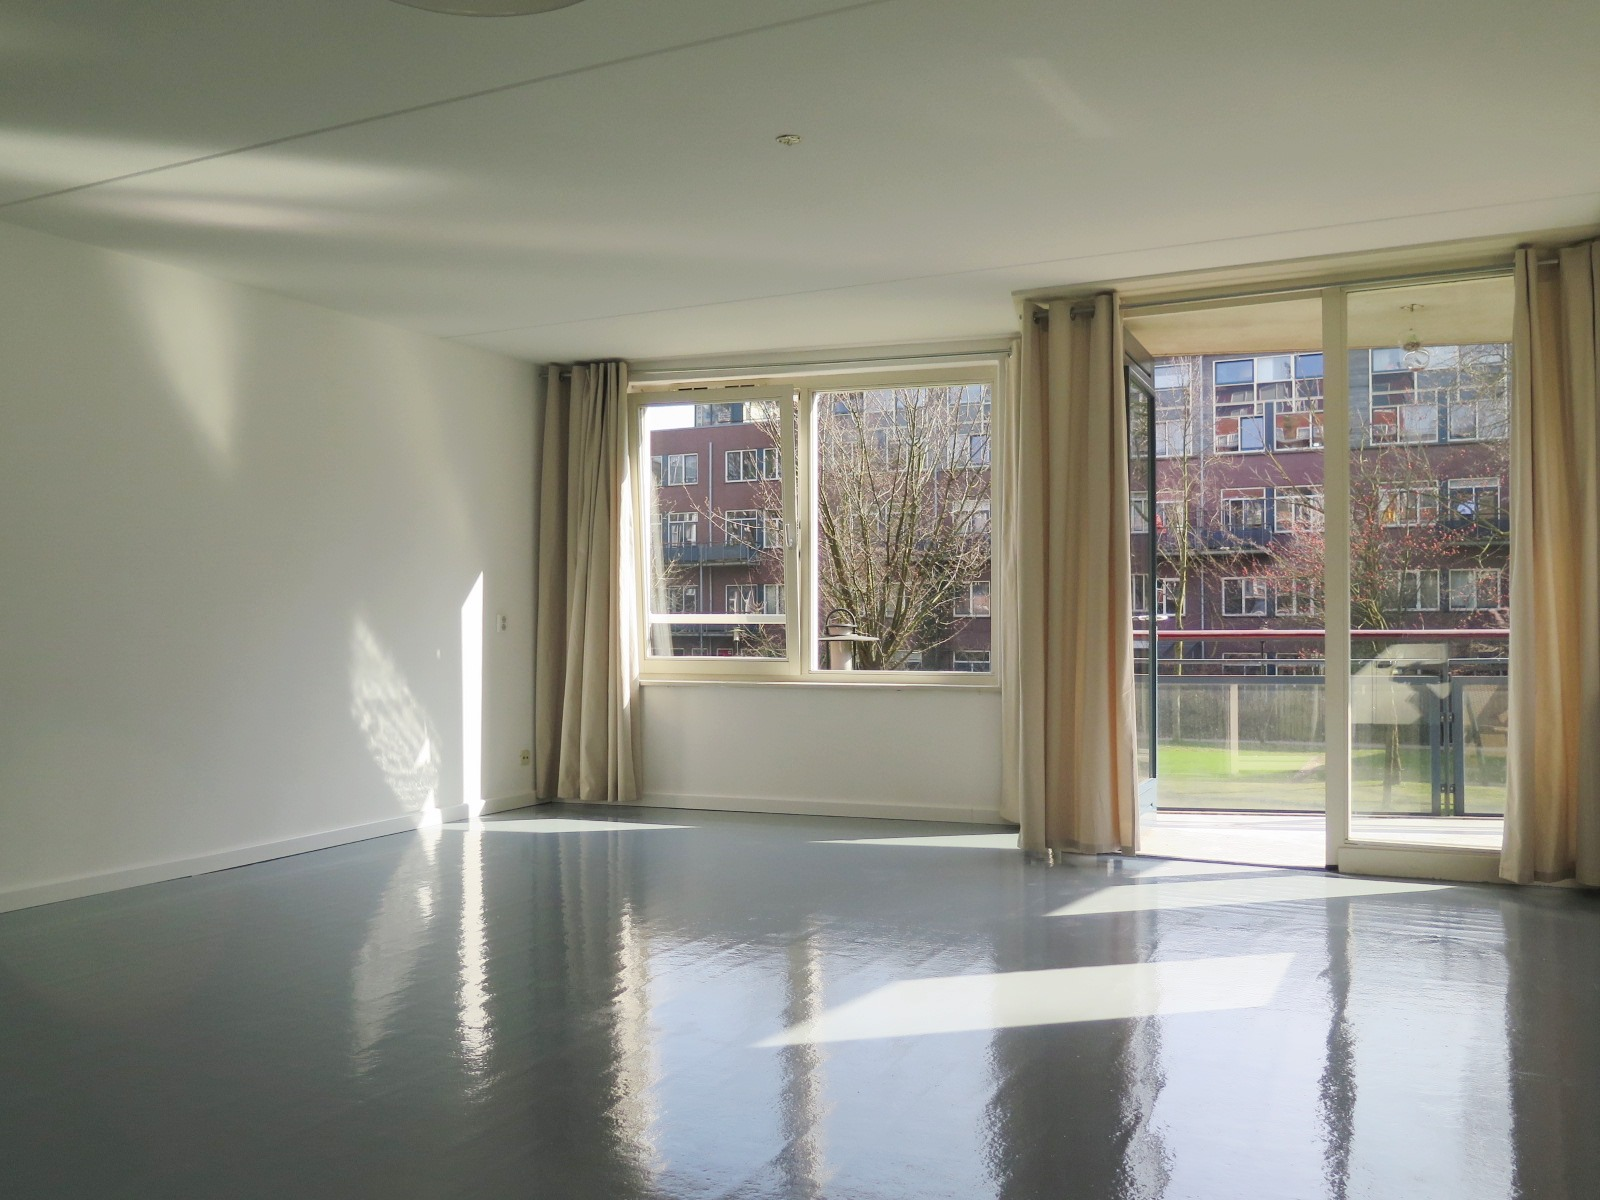 WG-plein, Amsterdam